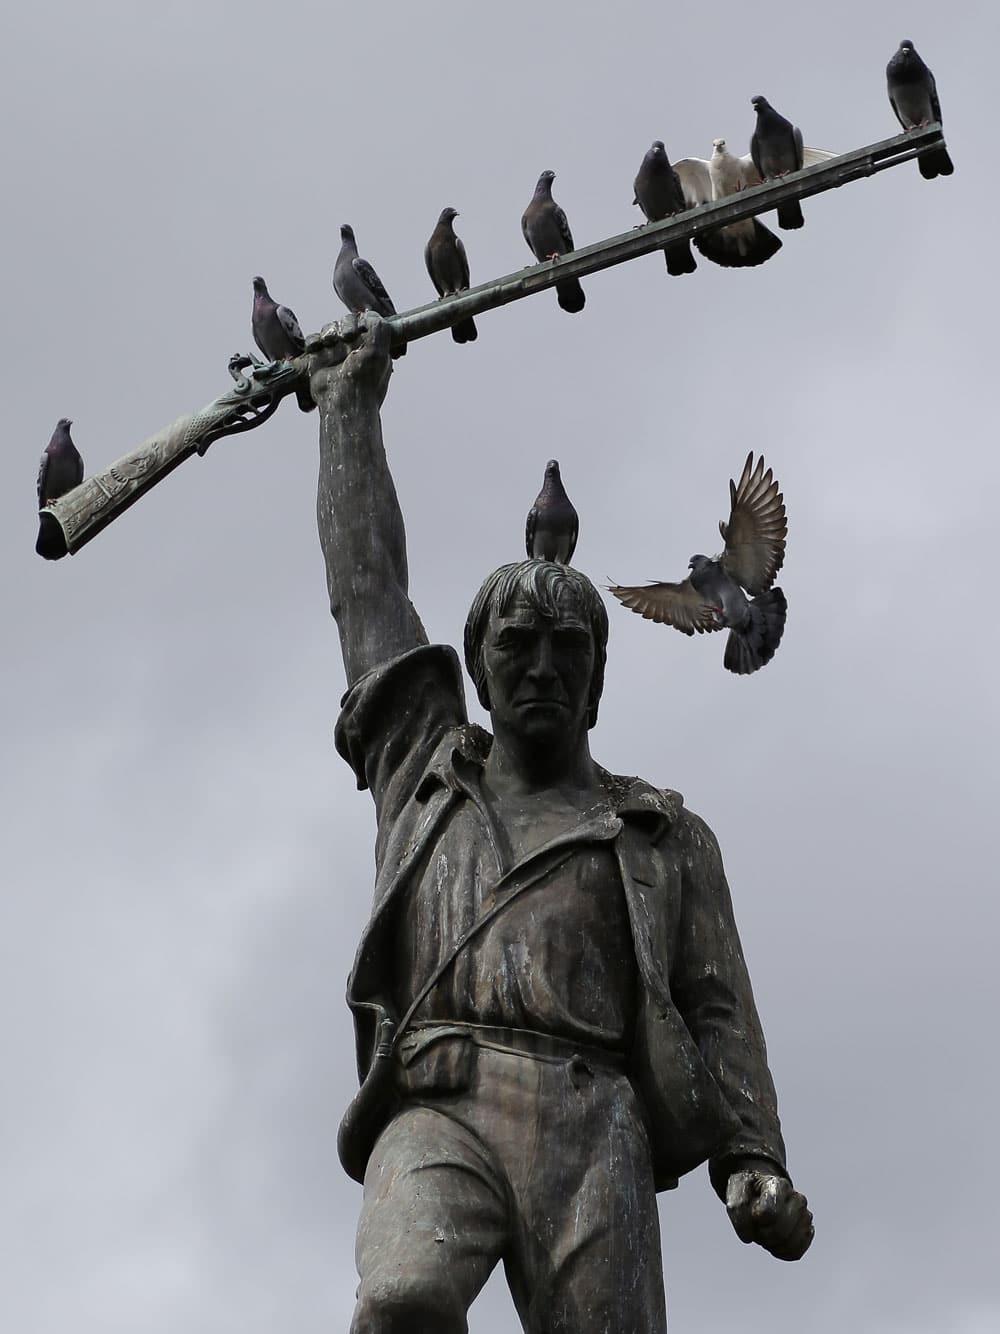 Pigeons roost under grey skies on the statue of Benjamin Rush Milam in Milam Park.